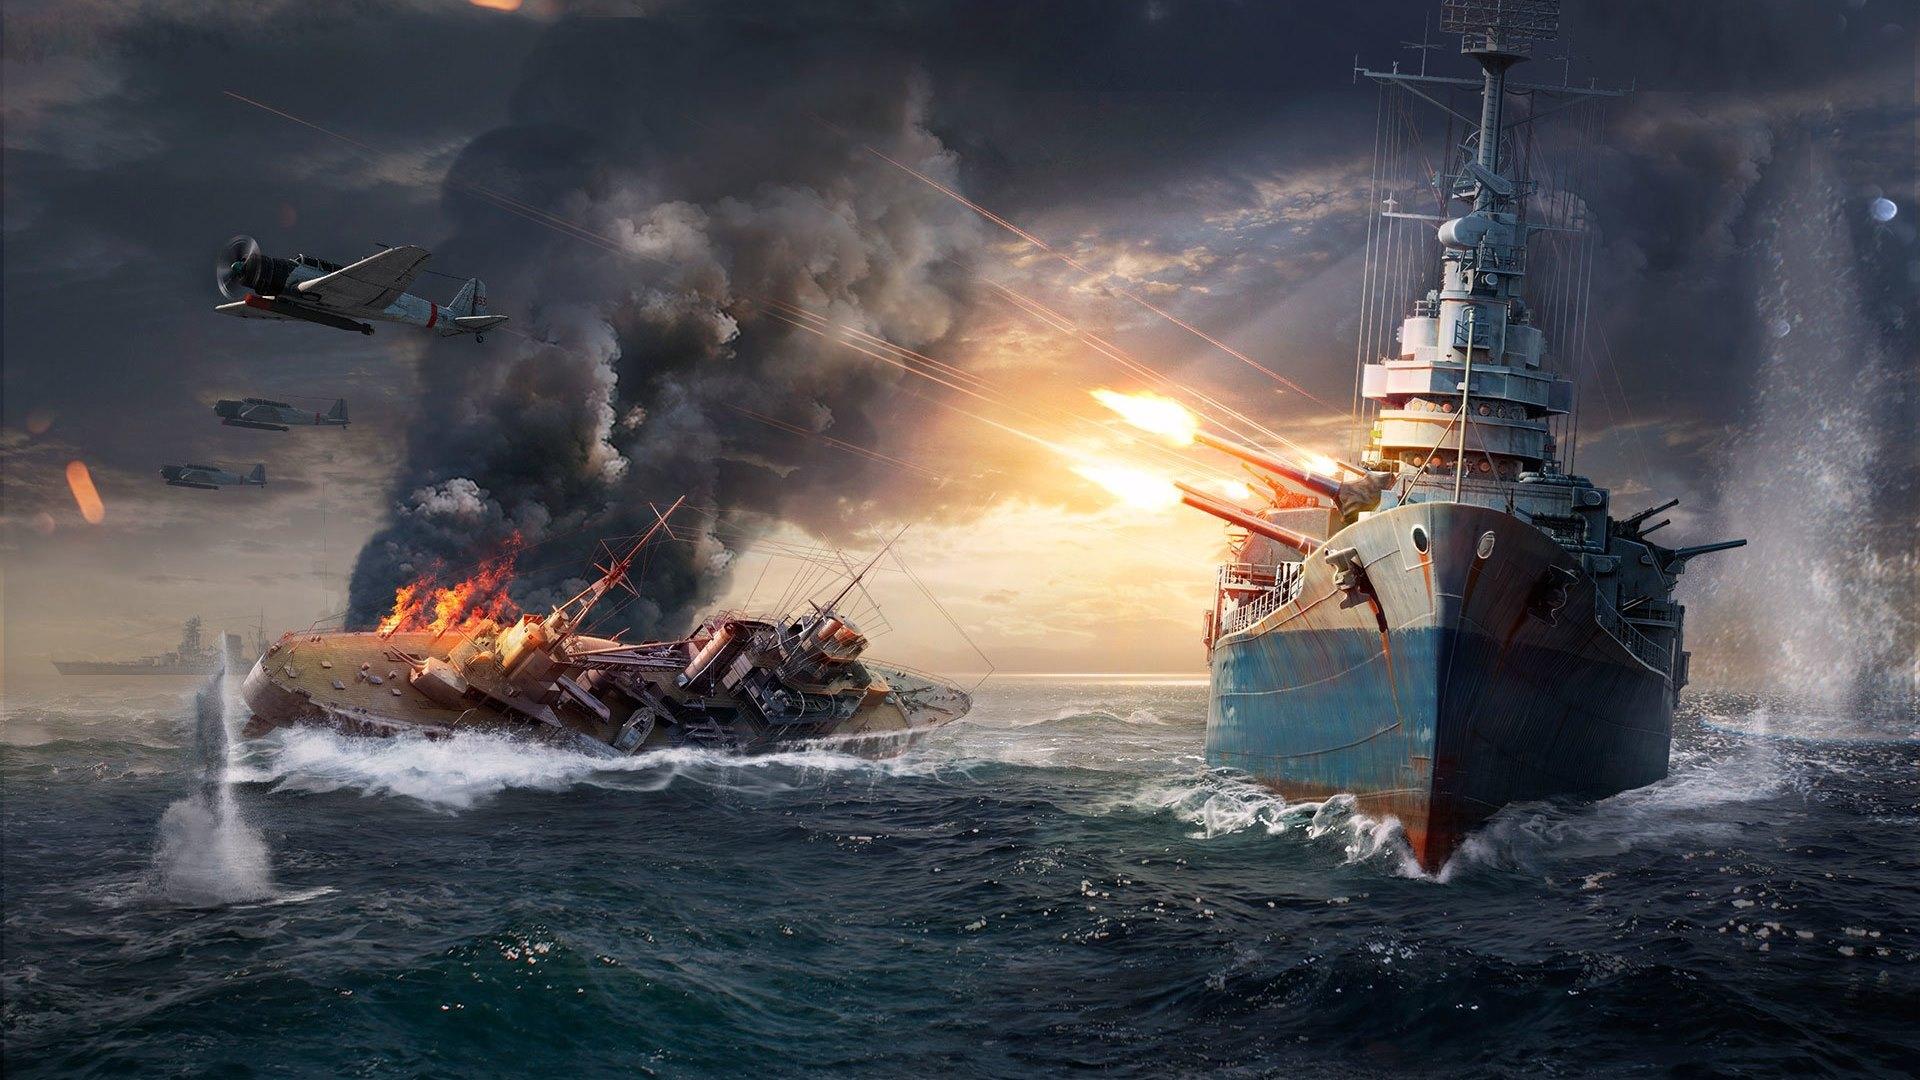 47 World Of Warships Wallpaper 1920x1080 On Wallpapersafari